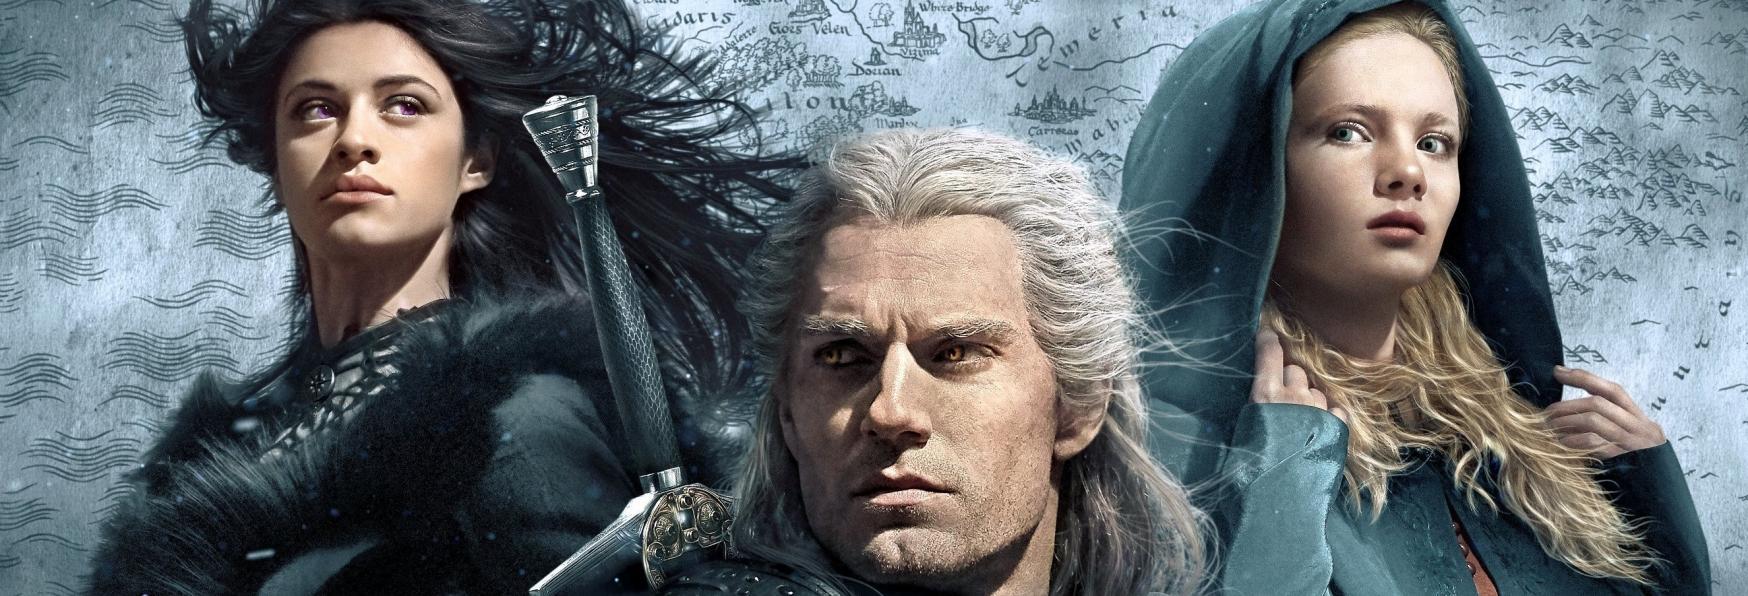 The Witcher, Joey Batey sulle differenze tra il suo Jaskier e Dandelion